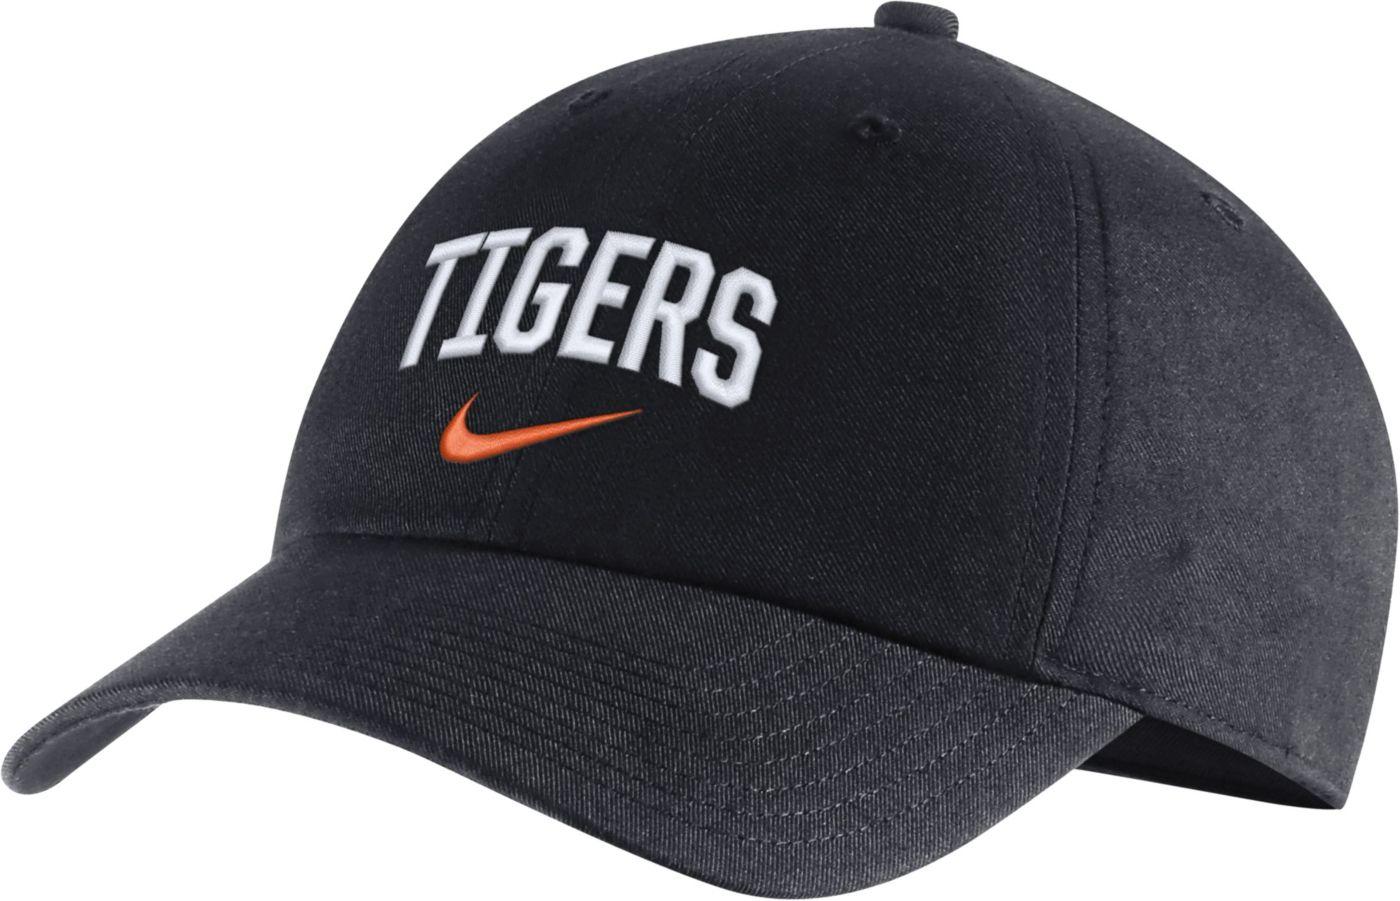 Nike Men's Detroit Tigers H86 Arch Adjustable Hat